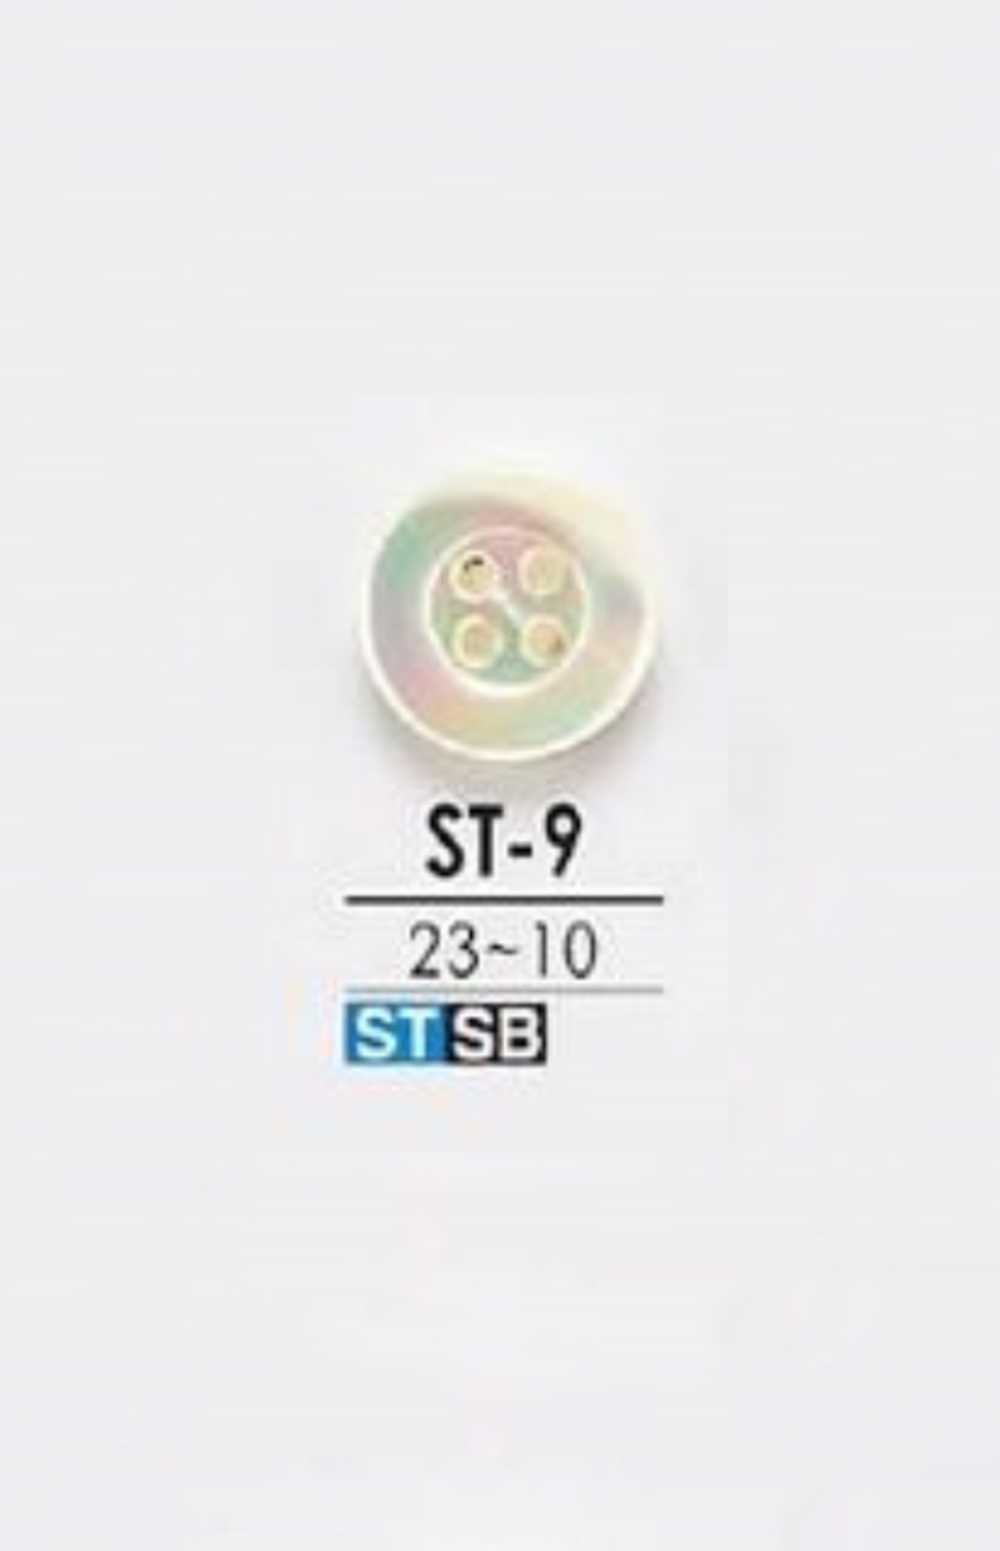 ST9 高瀬貝 4つ穴ボタン アイリス/オークラ商事 - ApparelX アパレル資材卸通販